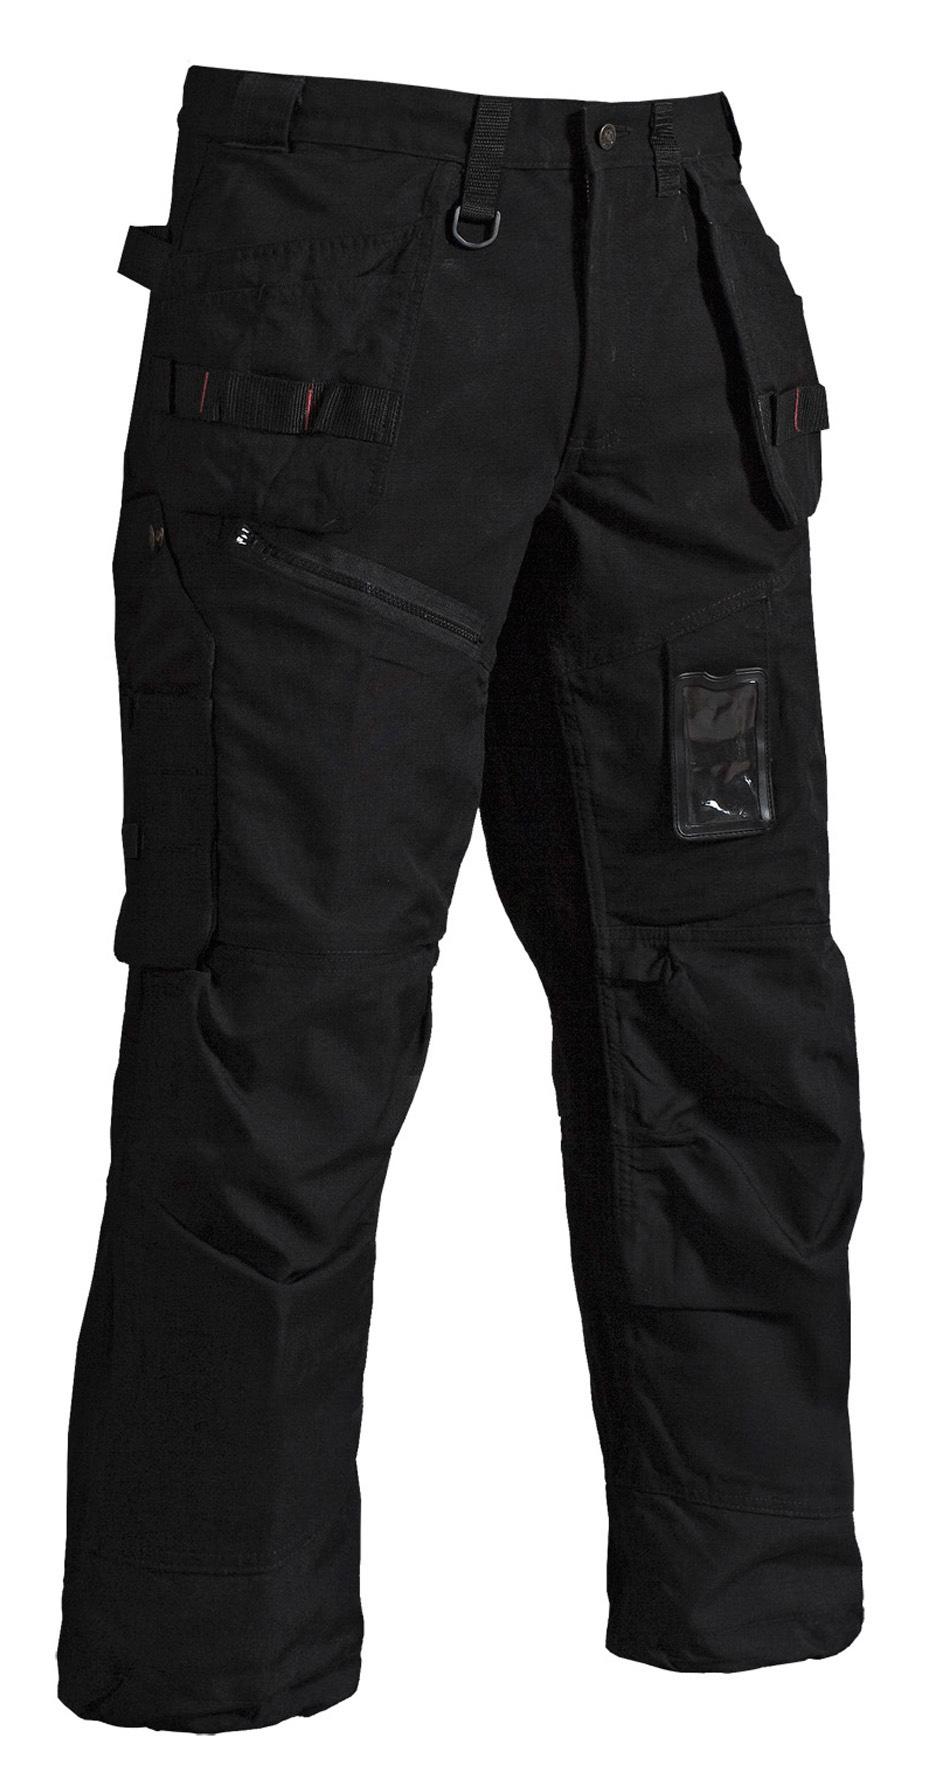 Noir T Courtes X1500 Artisan 46 Pantalon Jambes Blaklader q0OBxtI